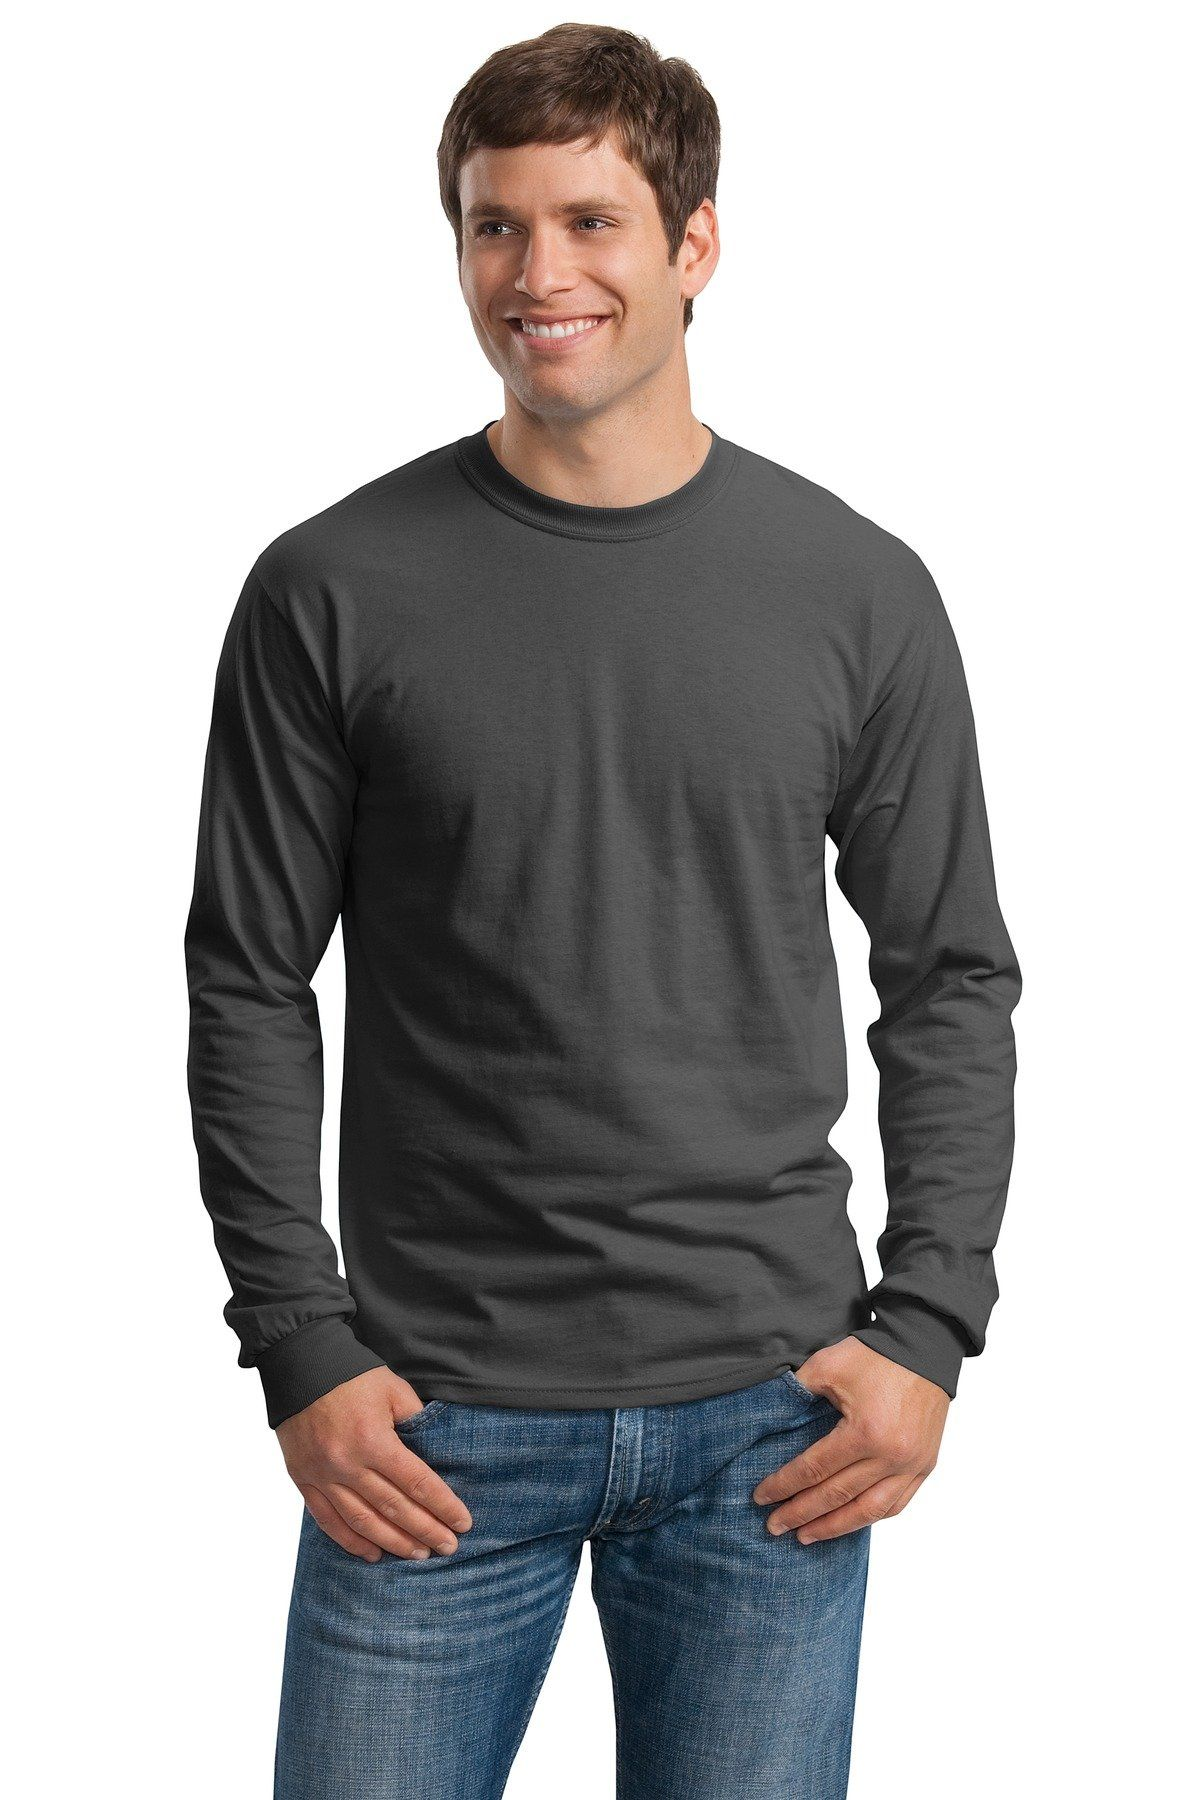 Cotton long sleeve tee shirt color charcoal size xxlarge